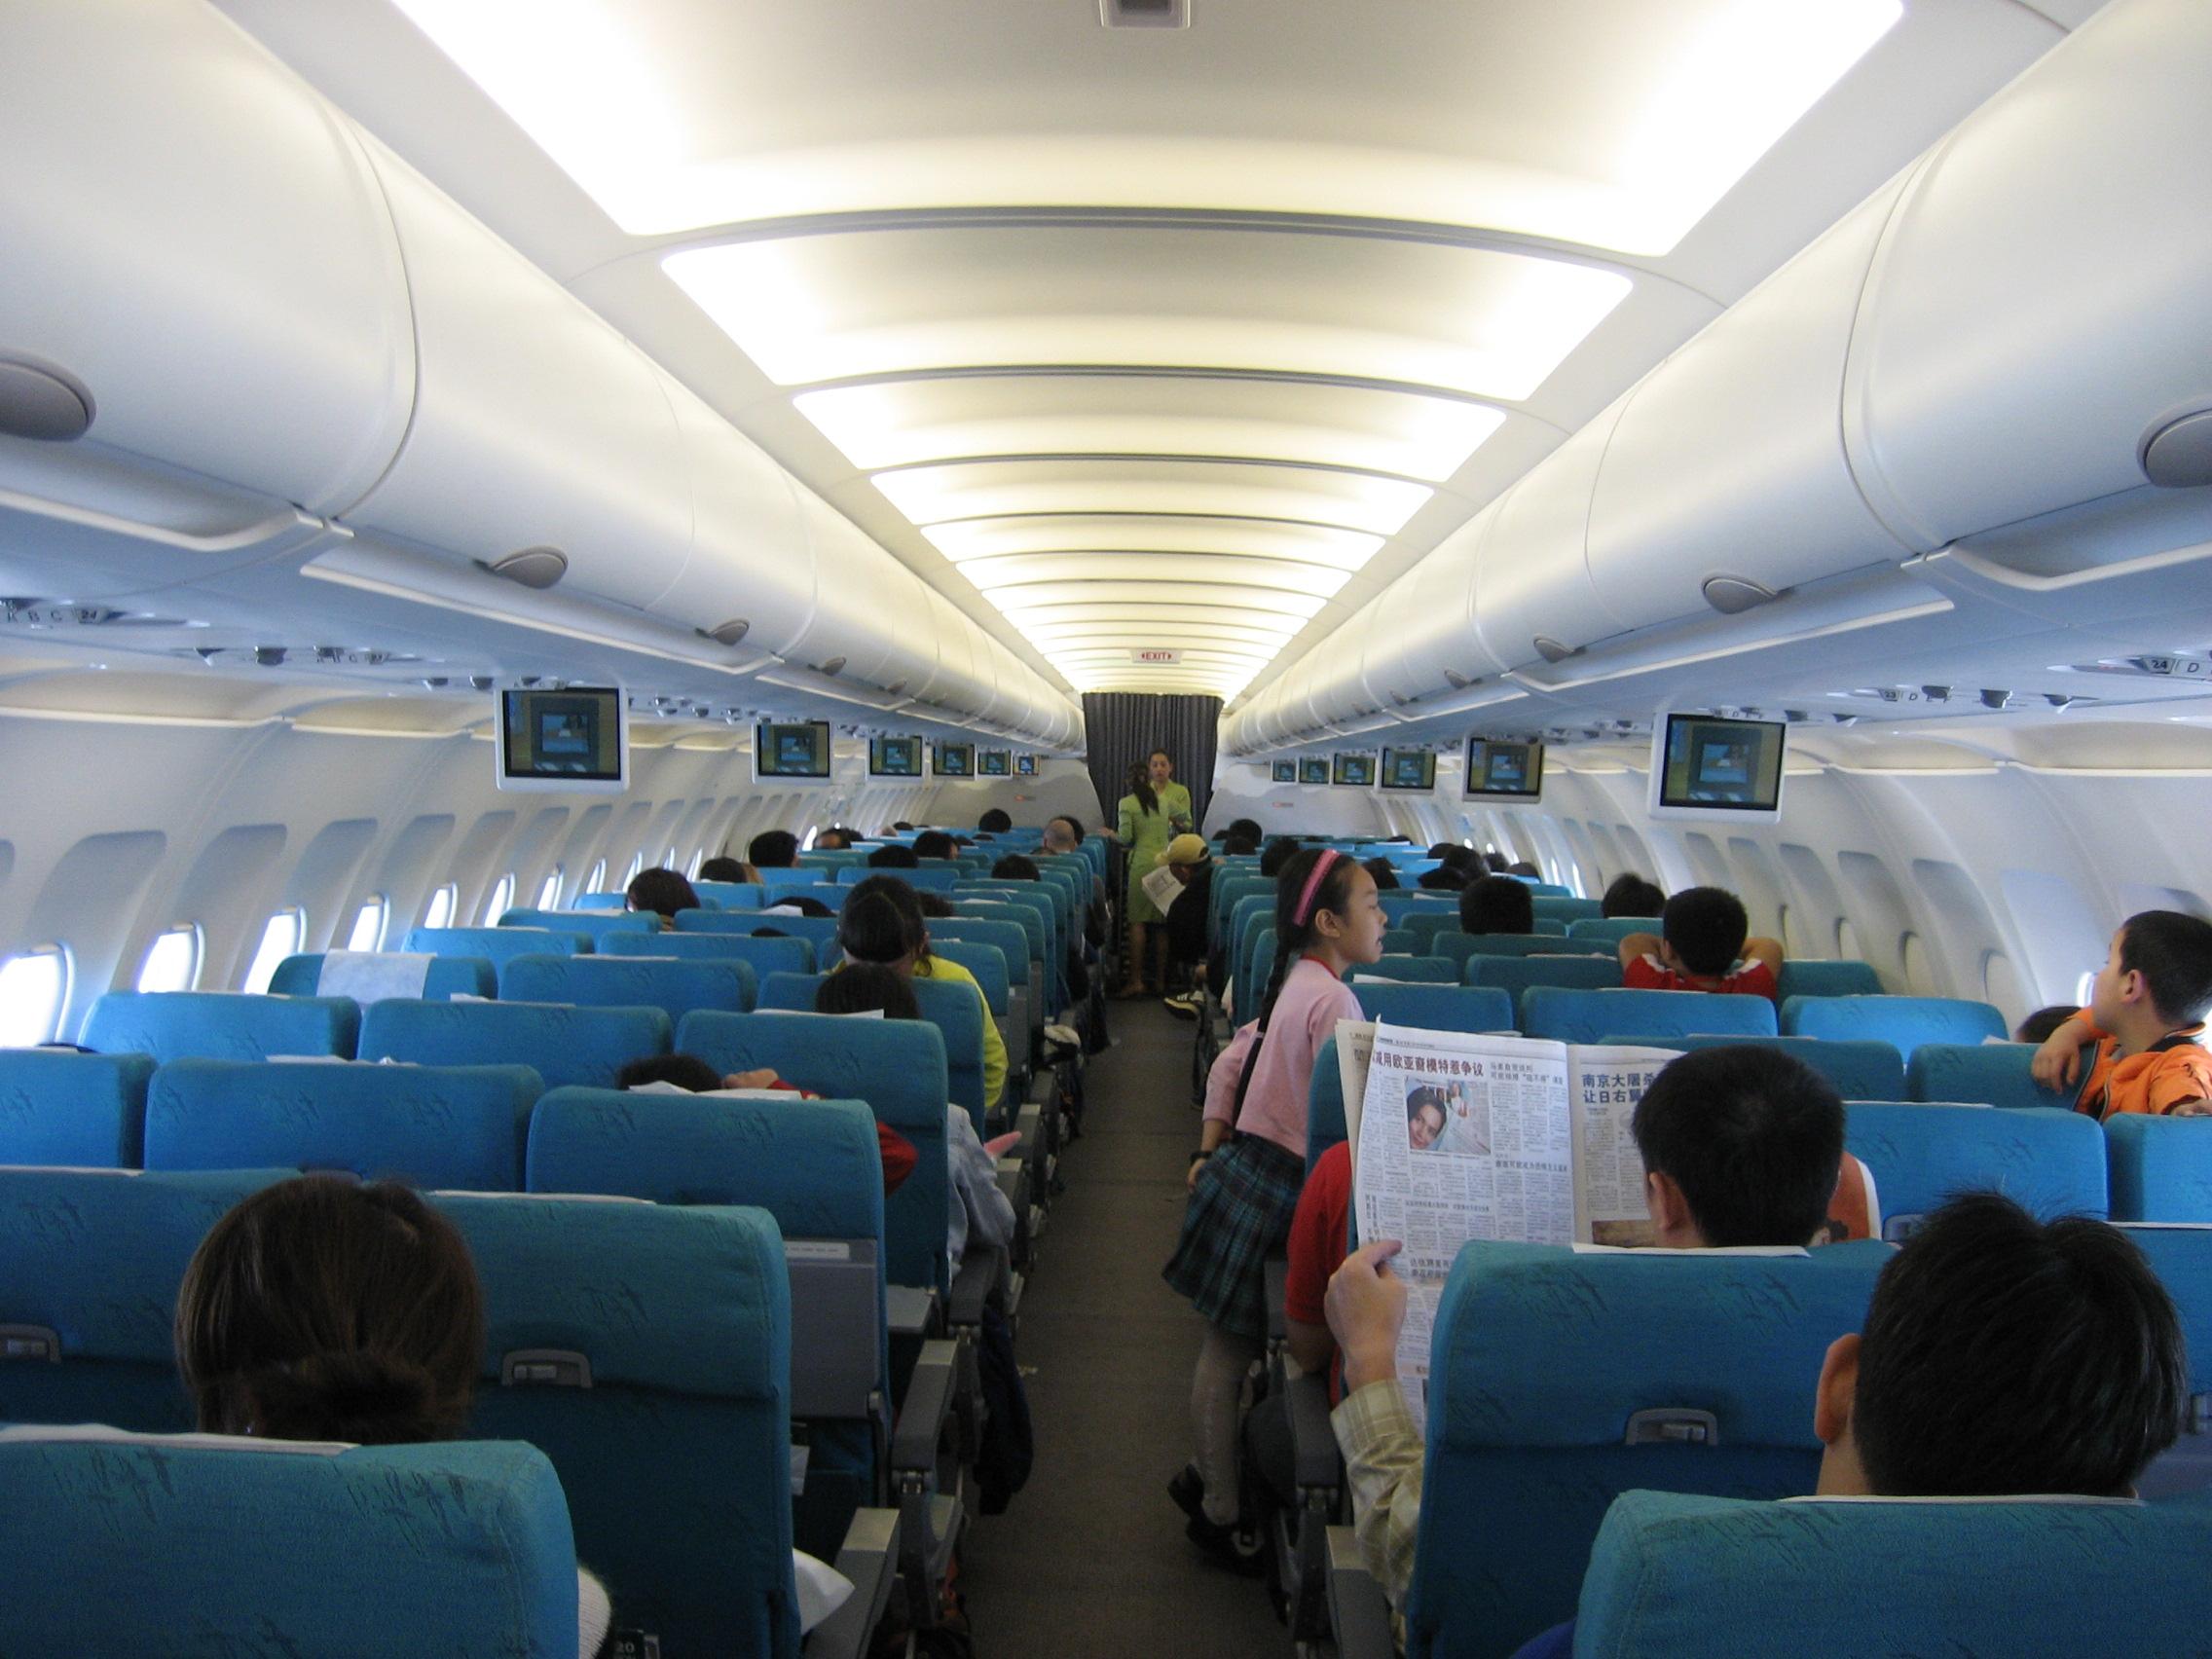 Cabin of Plane